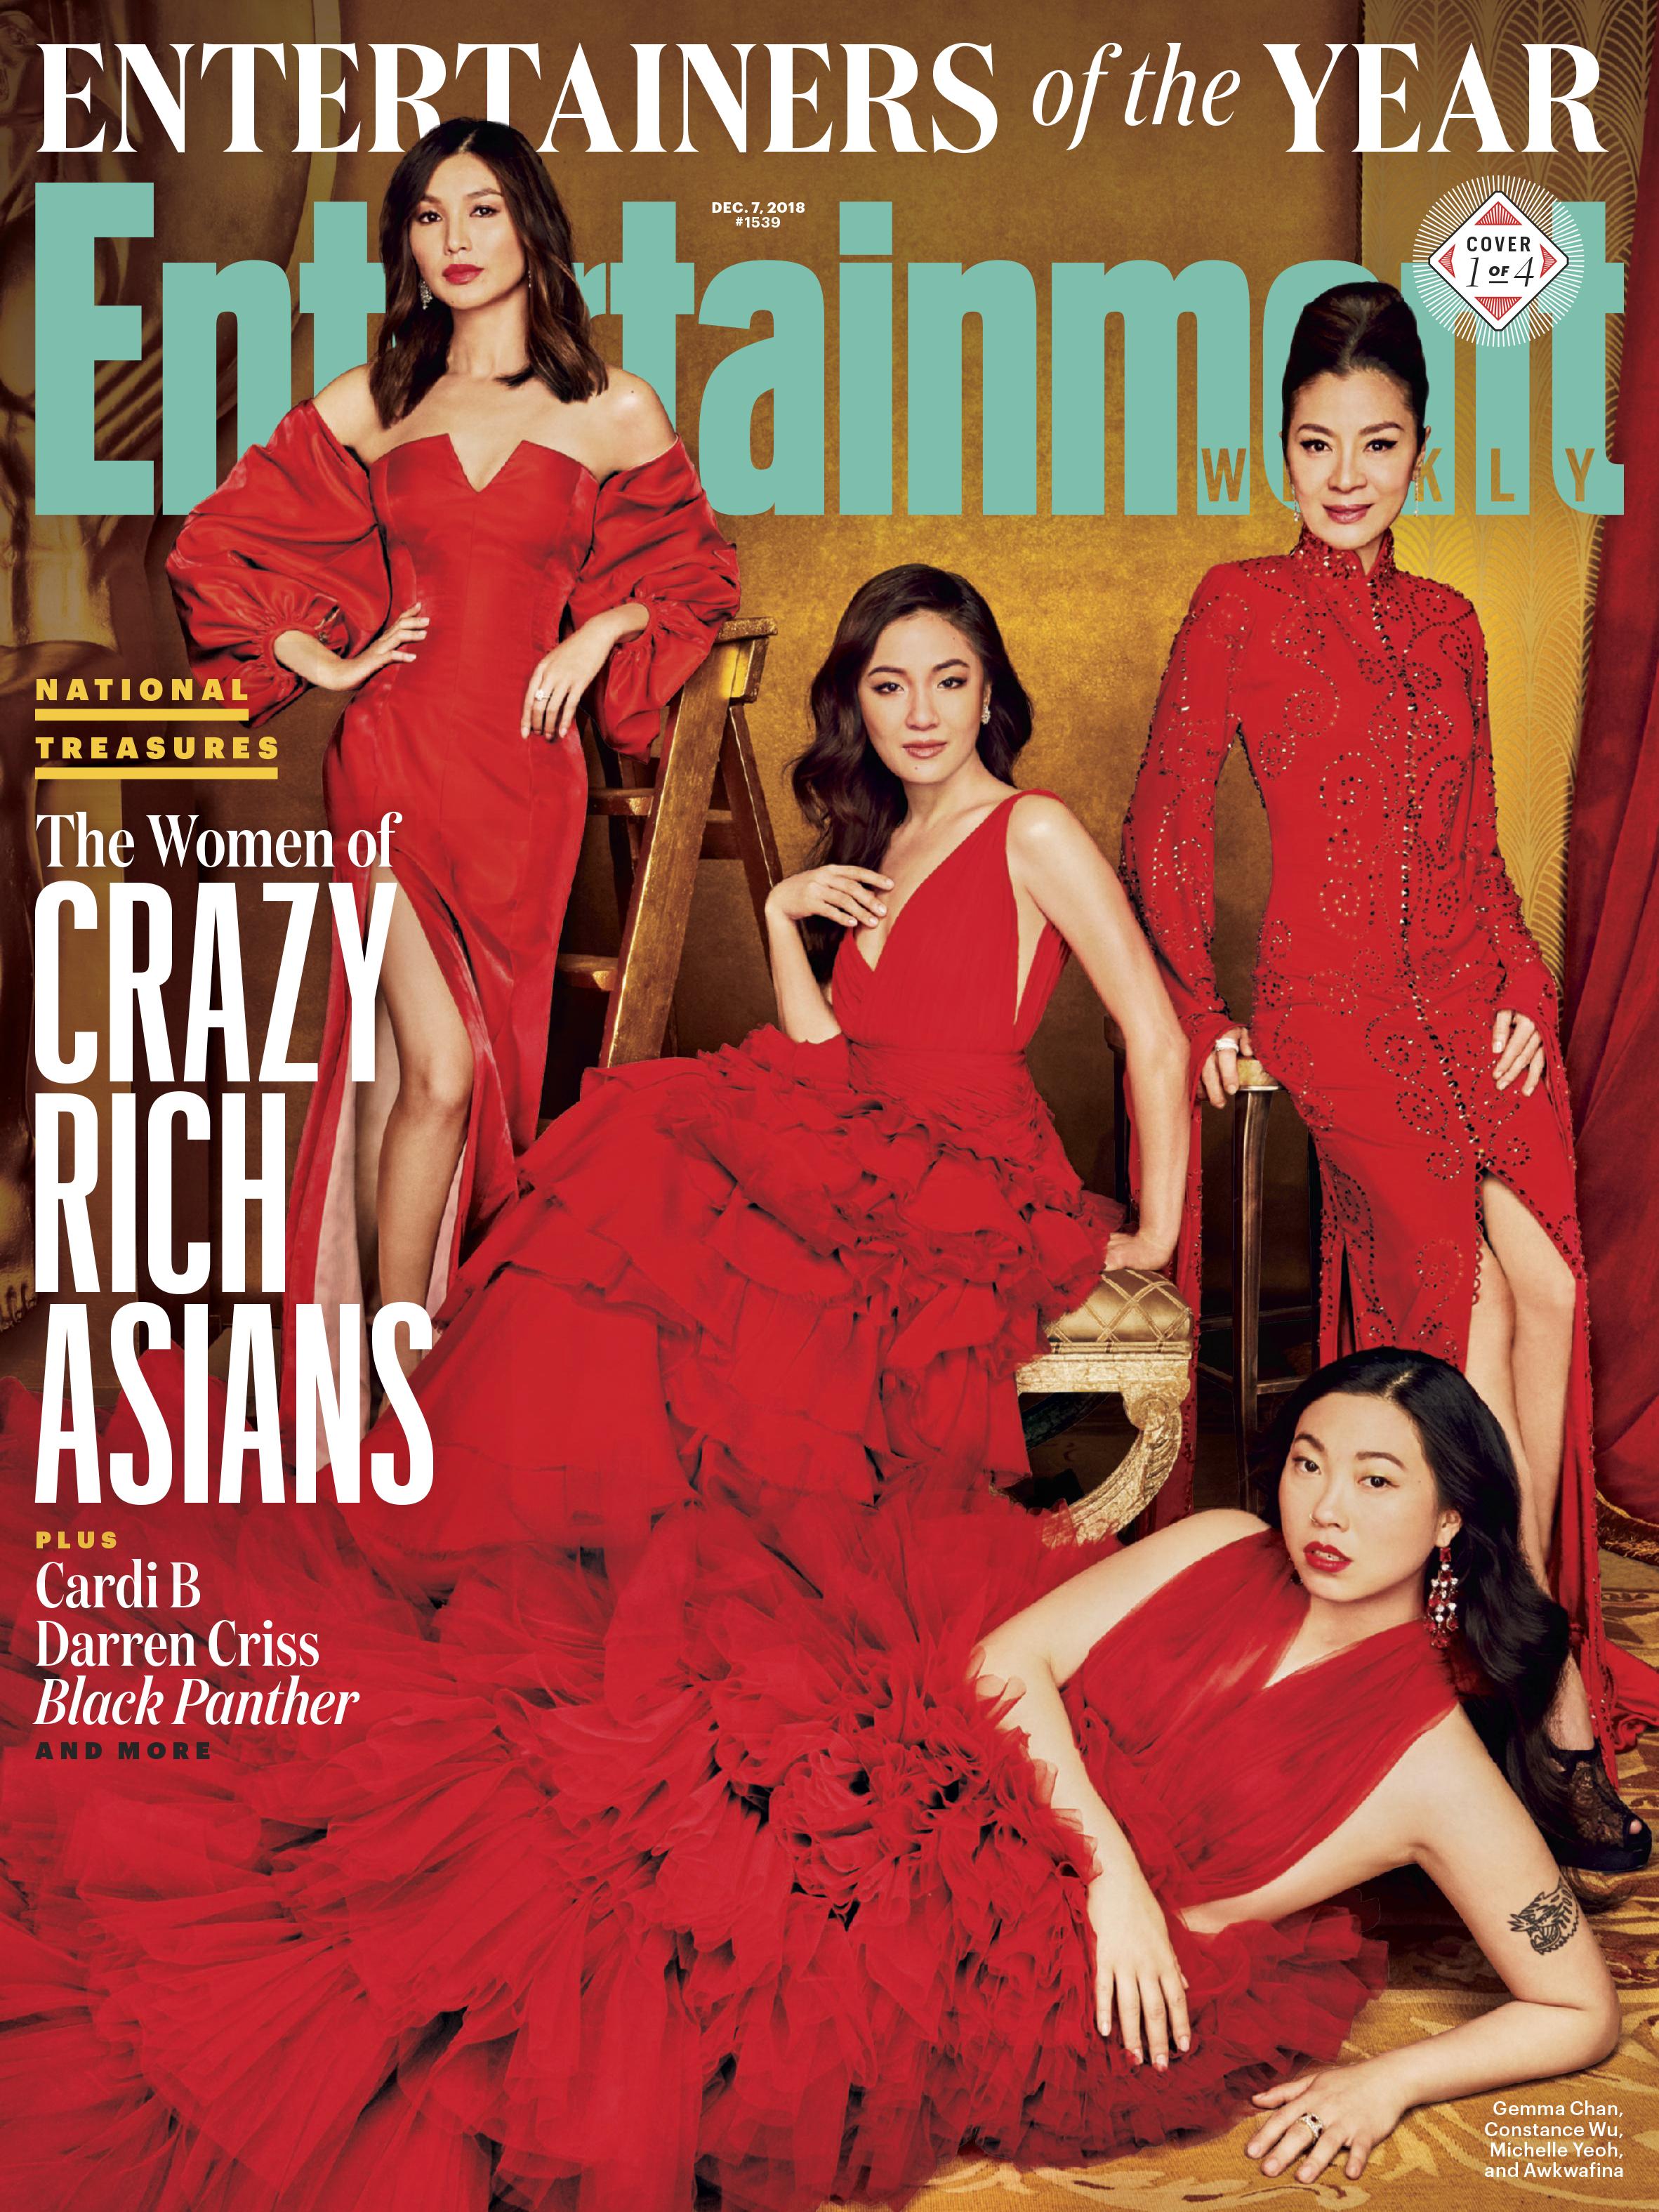 Entertainment Weekly - E-45104-585.jpg